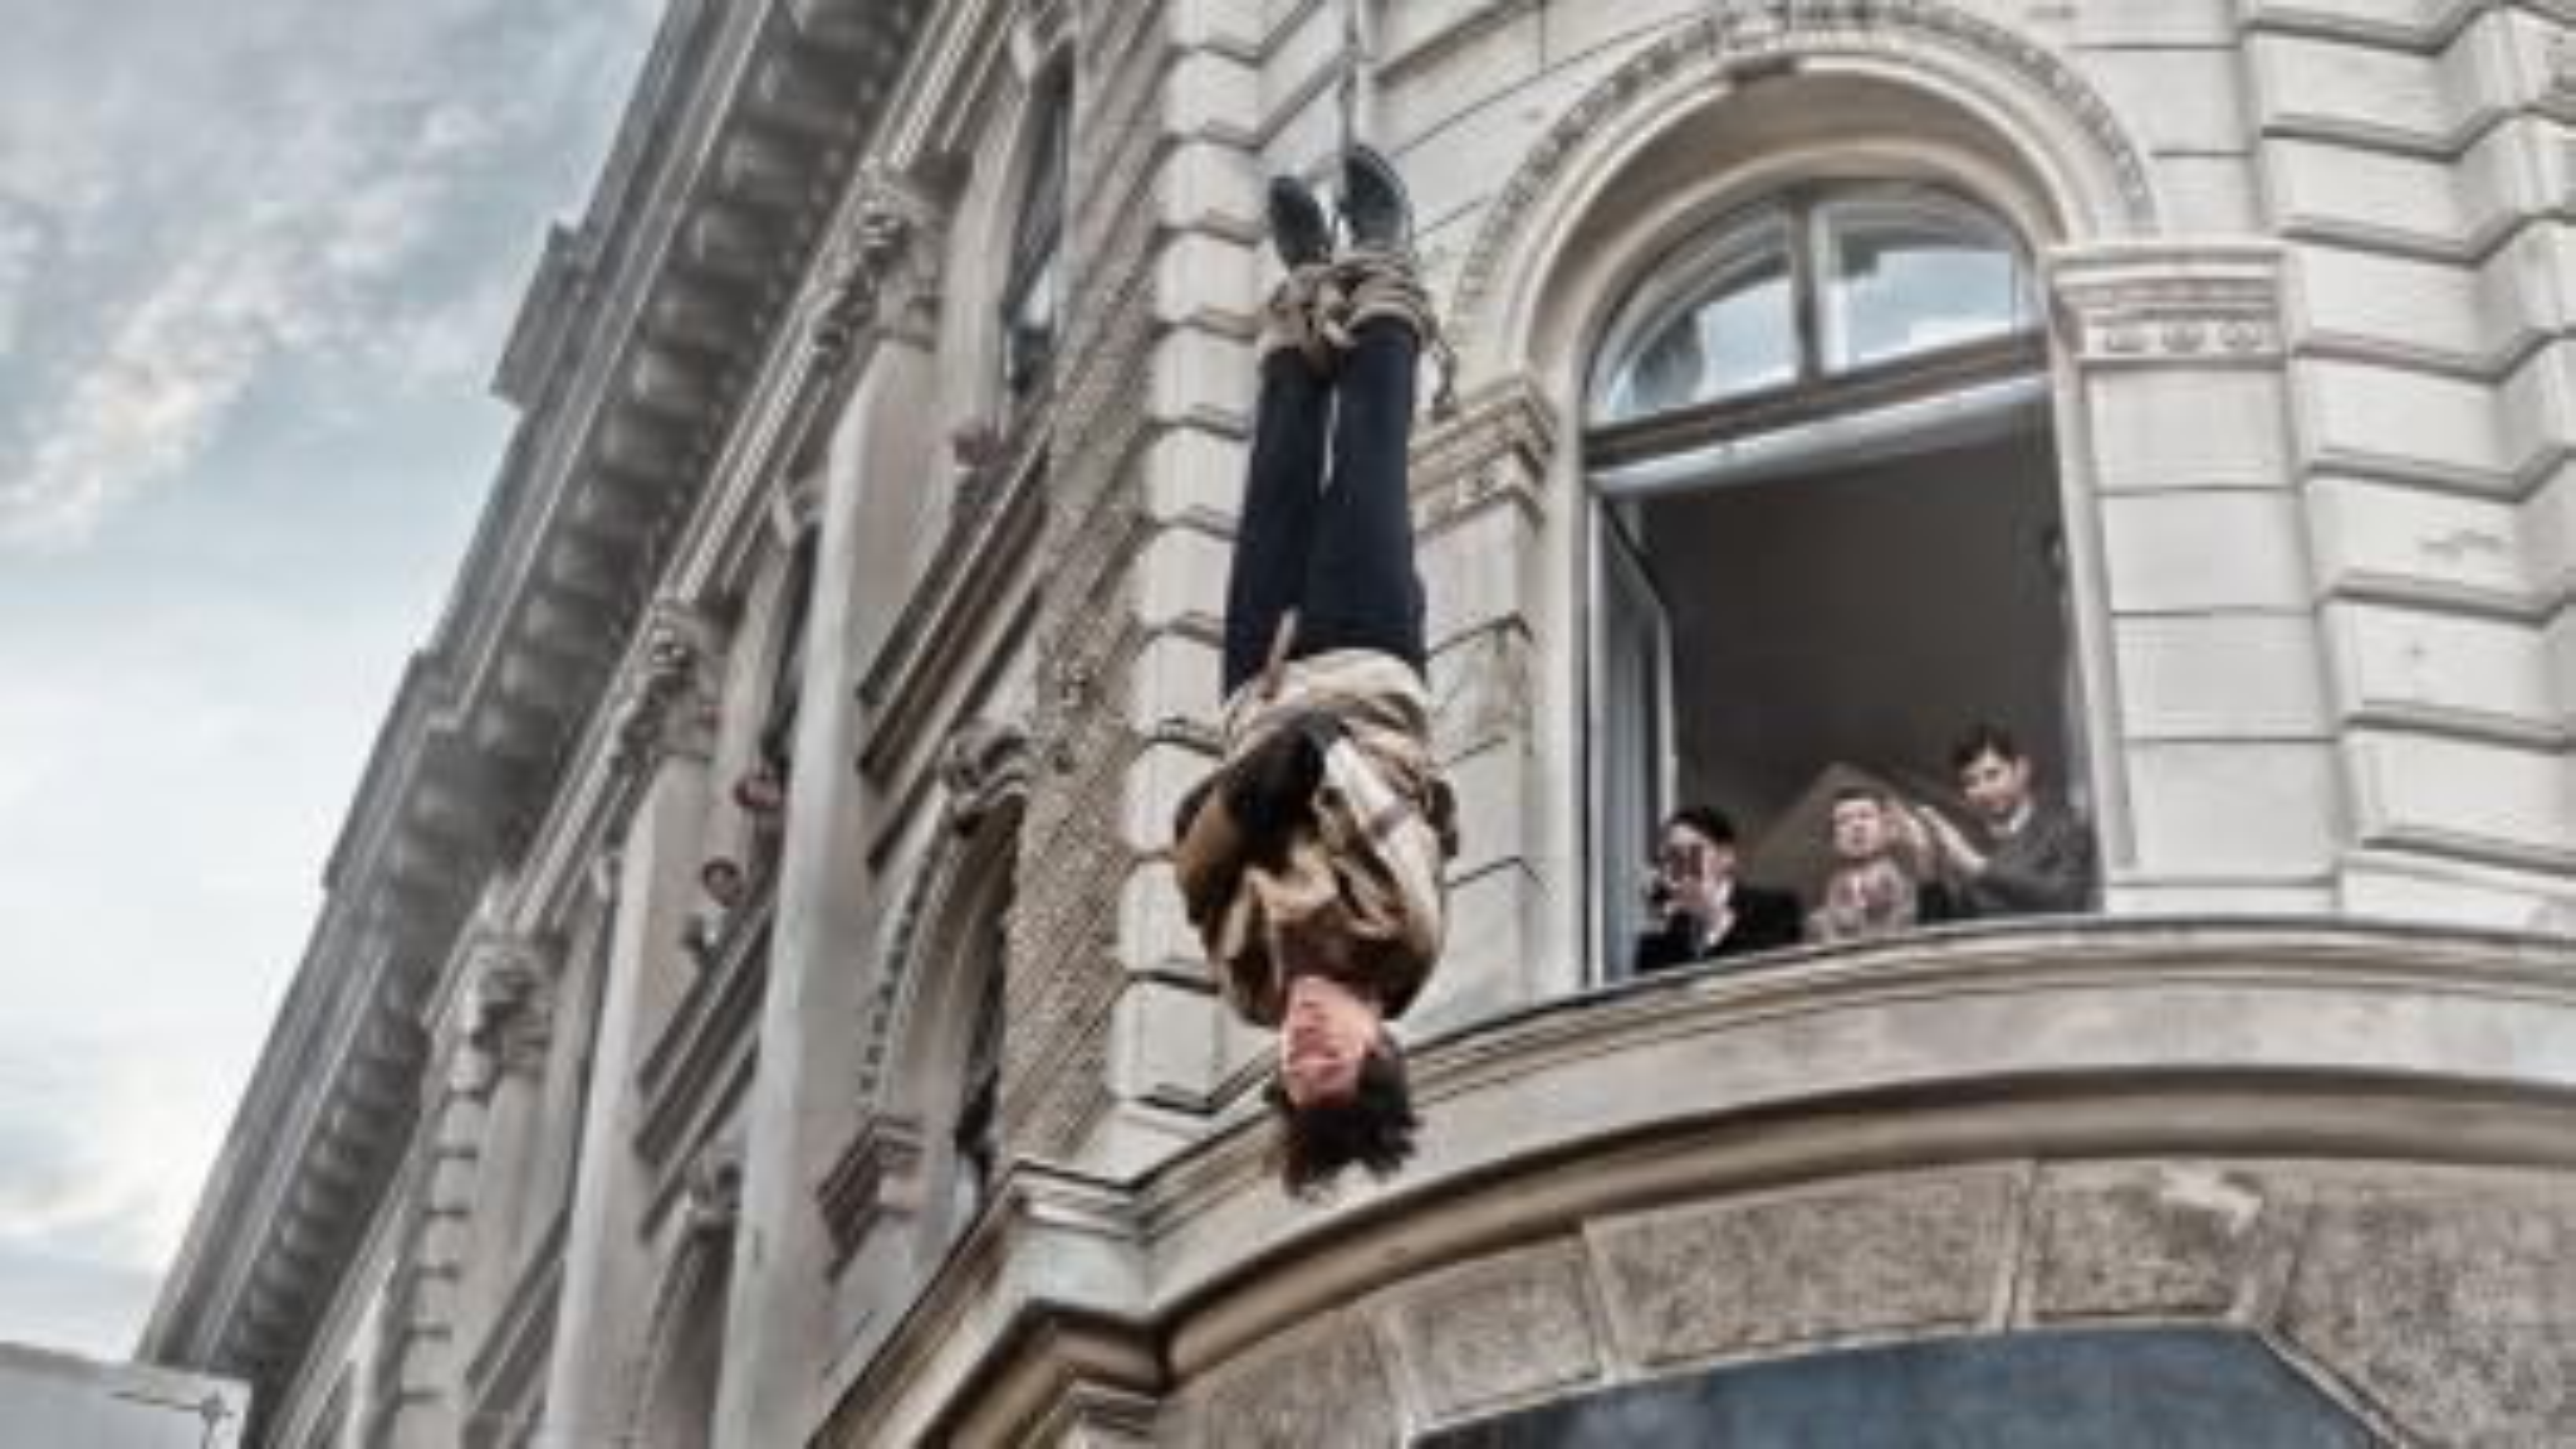 Houdini History channel